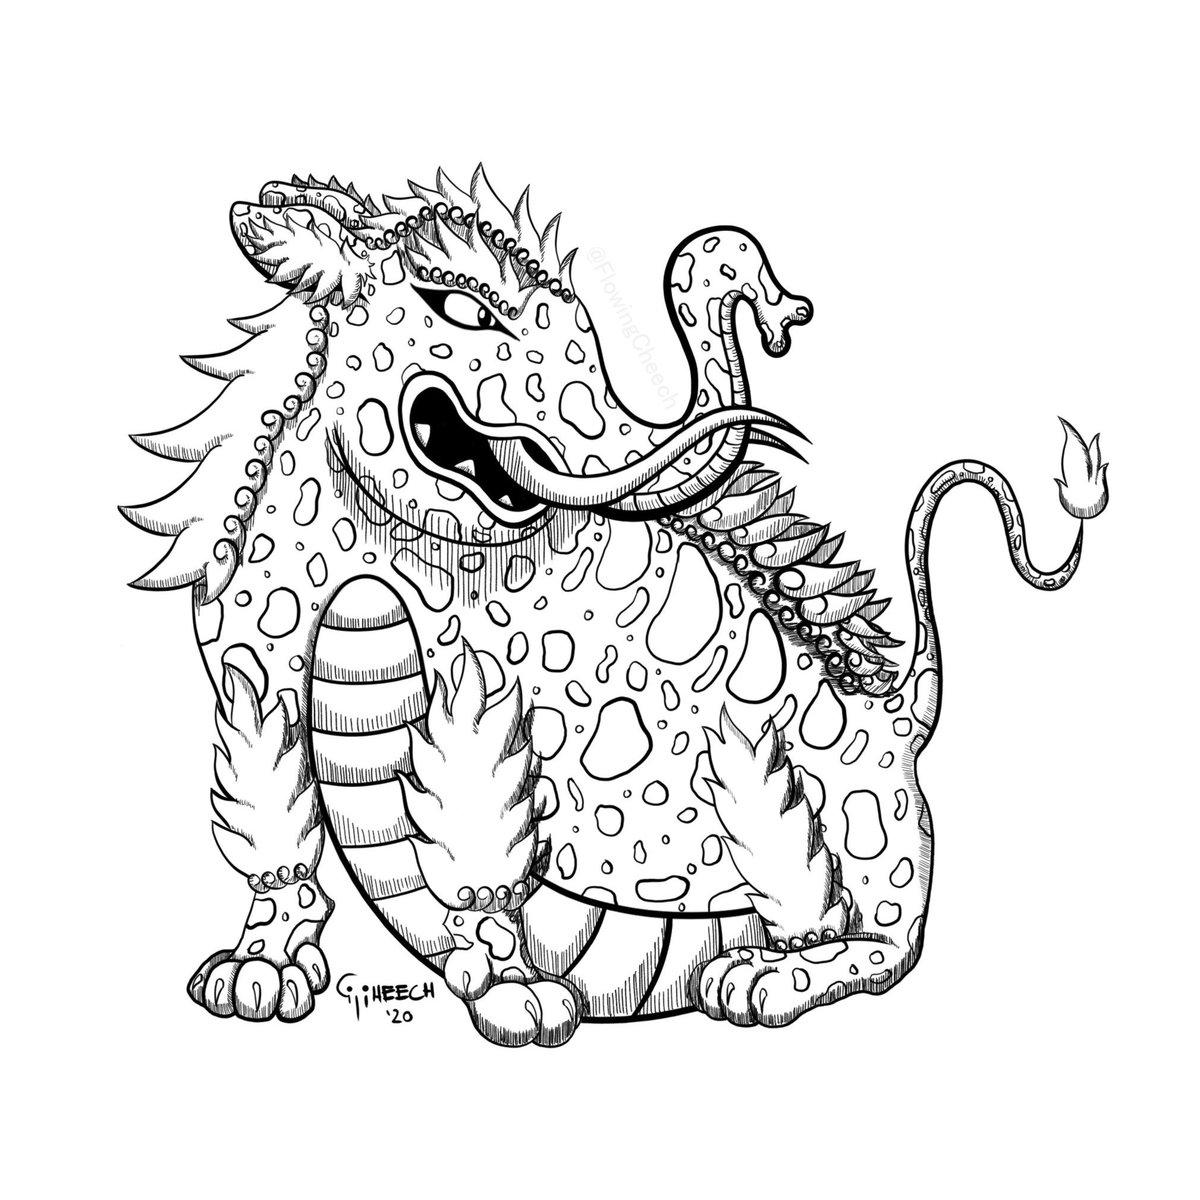 "Day 21: Beast, Yokai, Gentle Giant ~ This yokai is called ""Baku"" for anyone wondering 💤💤💤 ~ ~ #artober #artober2020 #mabsdrawlloweenclub #mabsdrawlloweenclub2020 #Monstober #Monstober2020 #digitalart #sketch #art #artistsontwitter #drawing #illustration #ink https://t.co/xFgADE3tWT"